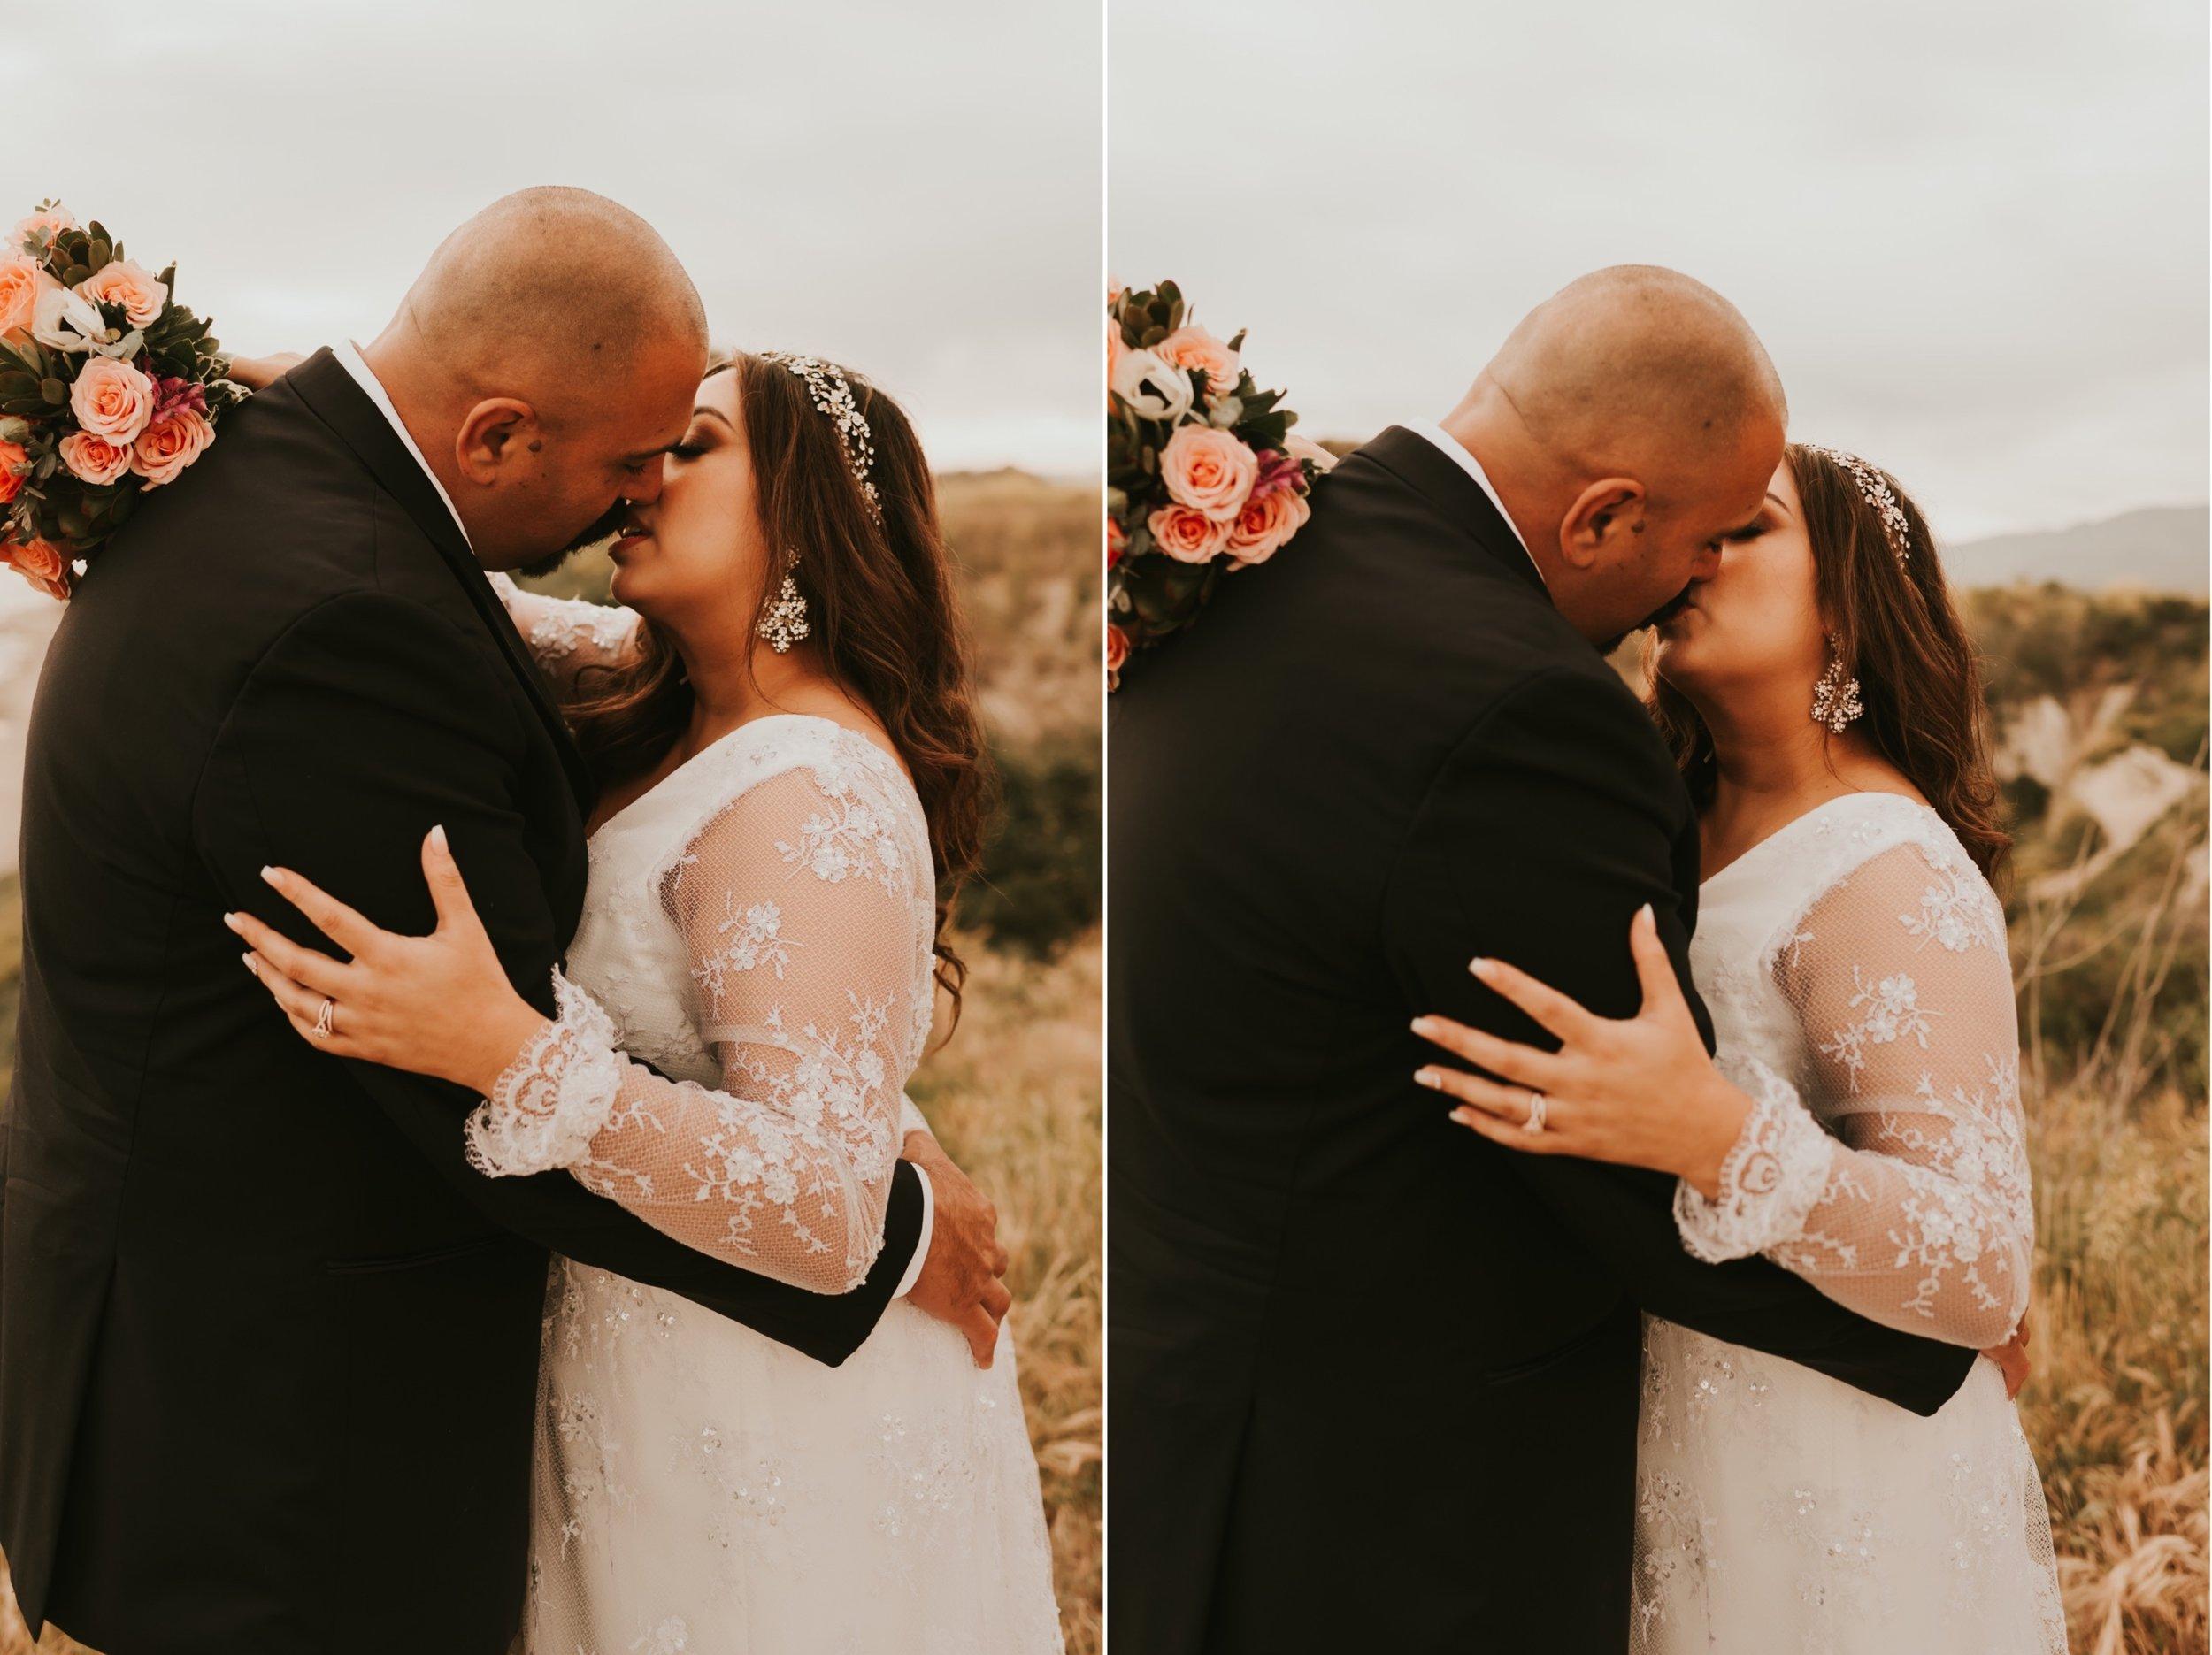 Ellwood Bluffs Santa Barbara Elopement | Carrie Rogers Photography | Santa Barbara Wedding Photographer | California Elopement Photographer |  #couples #weddingphotography #elopement #couplegoals